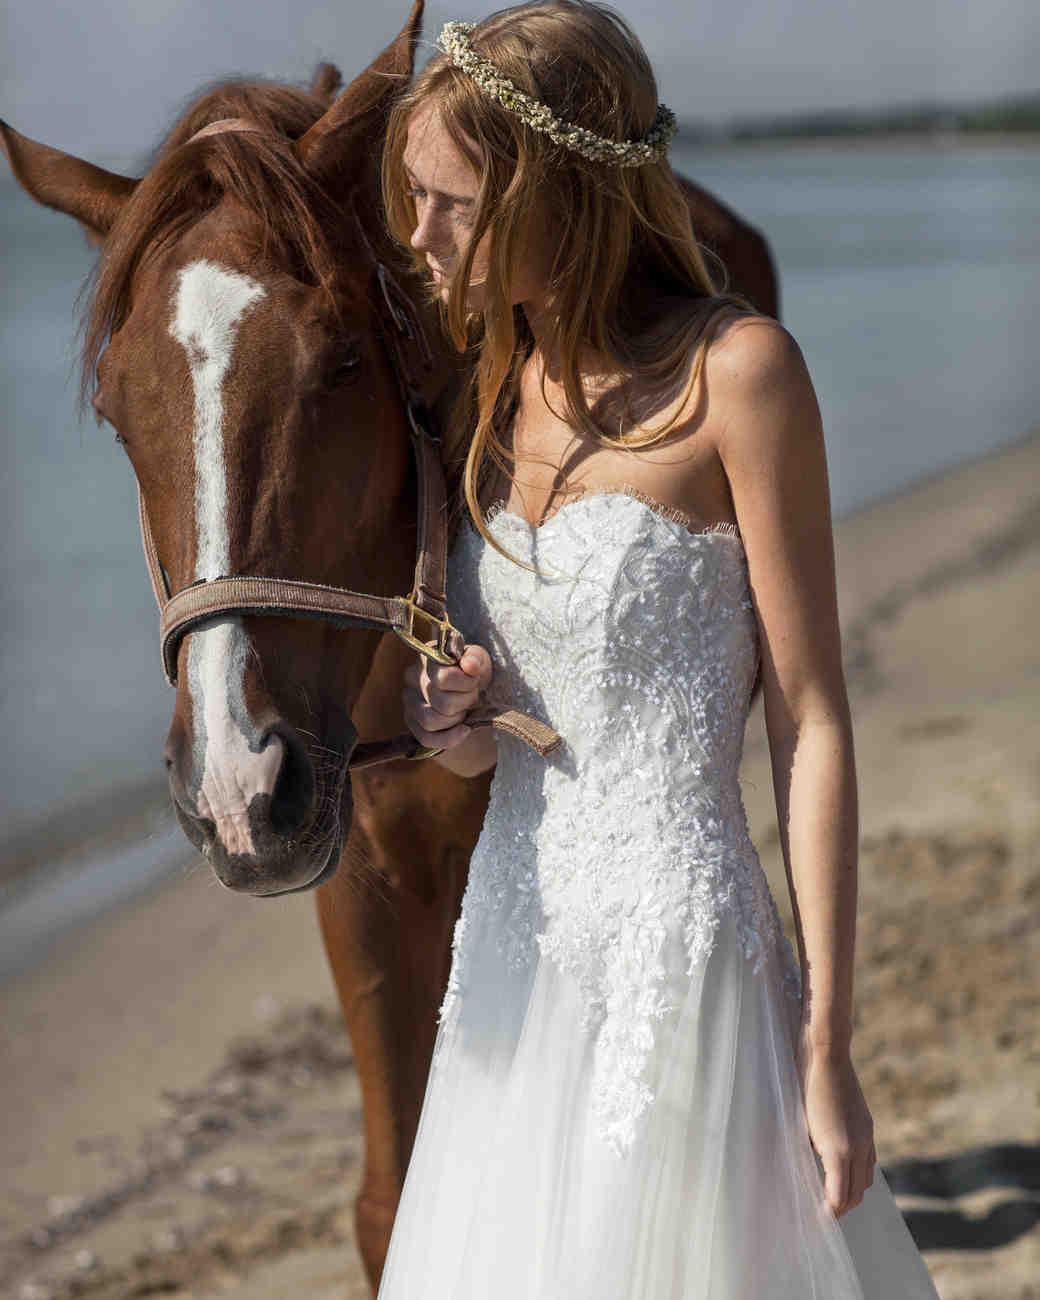 costarellos-fall2016-wedding-dress-16-55.jpg